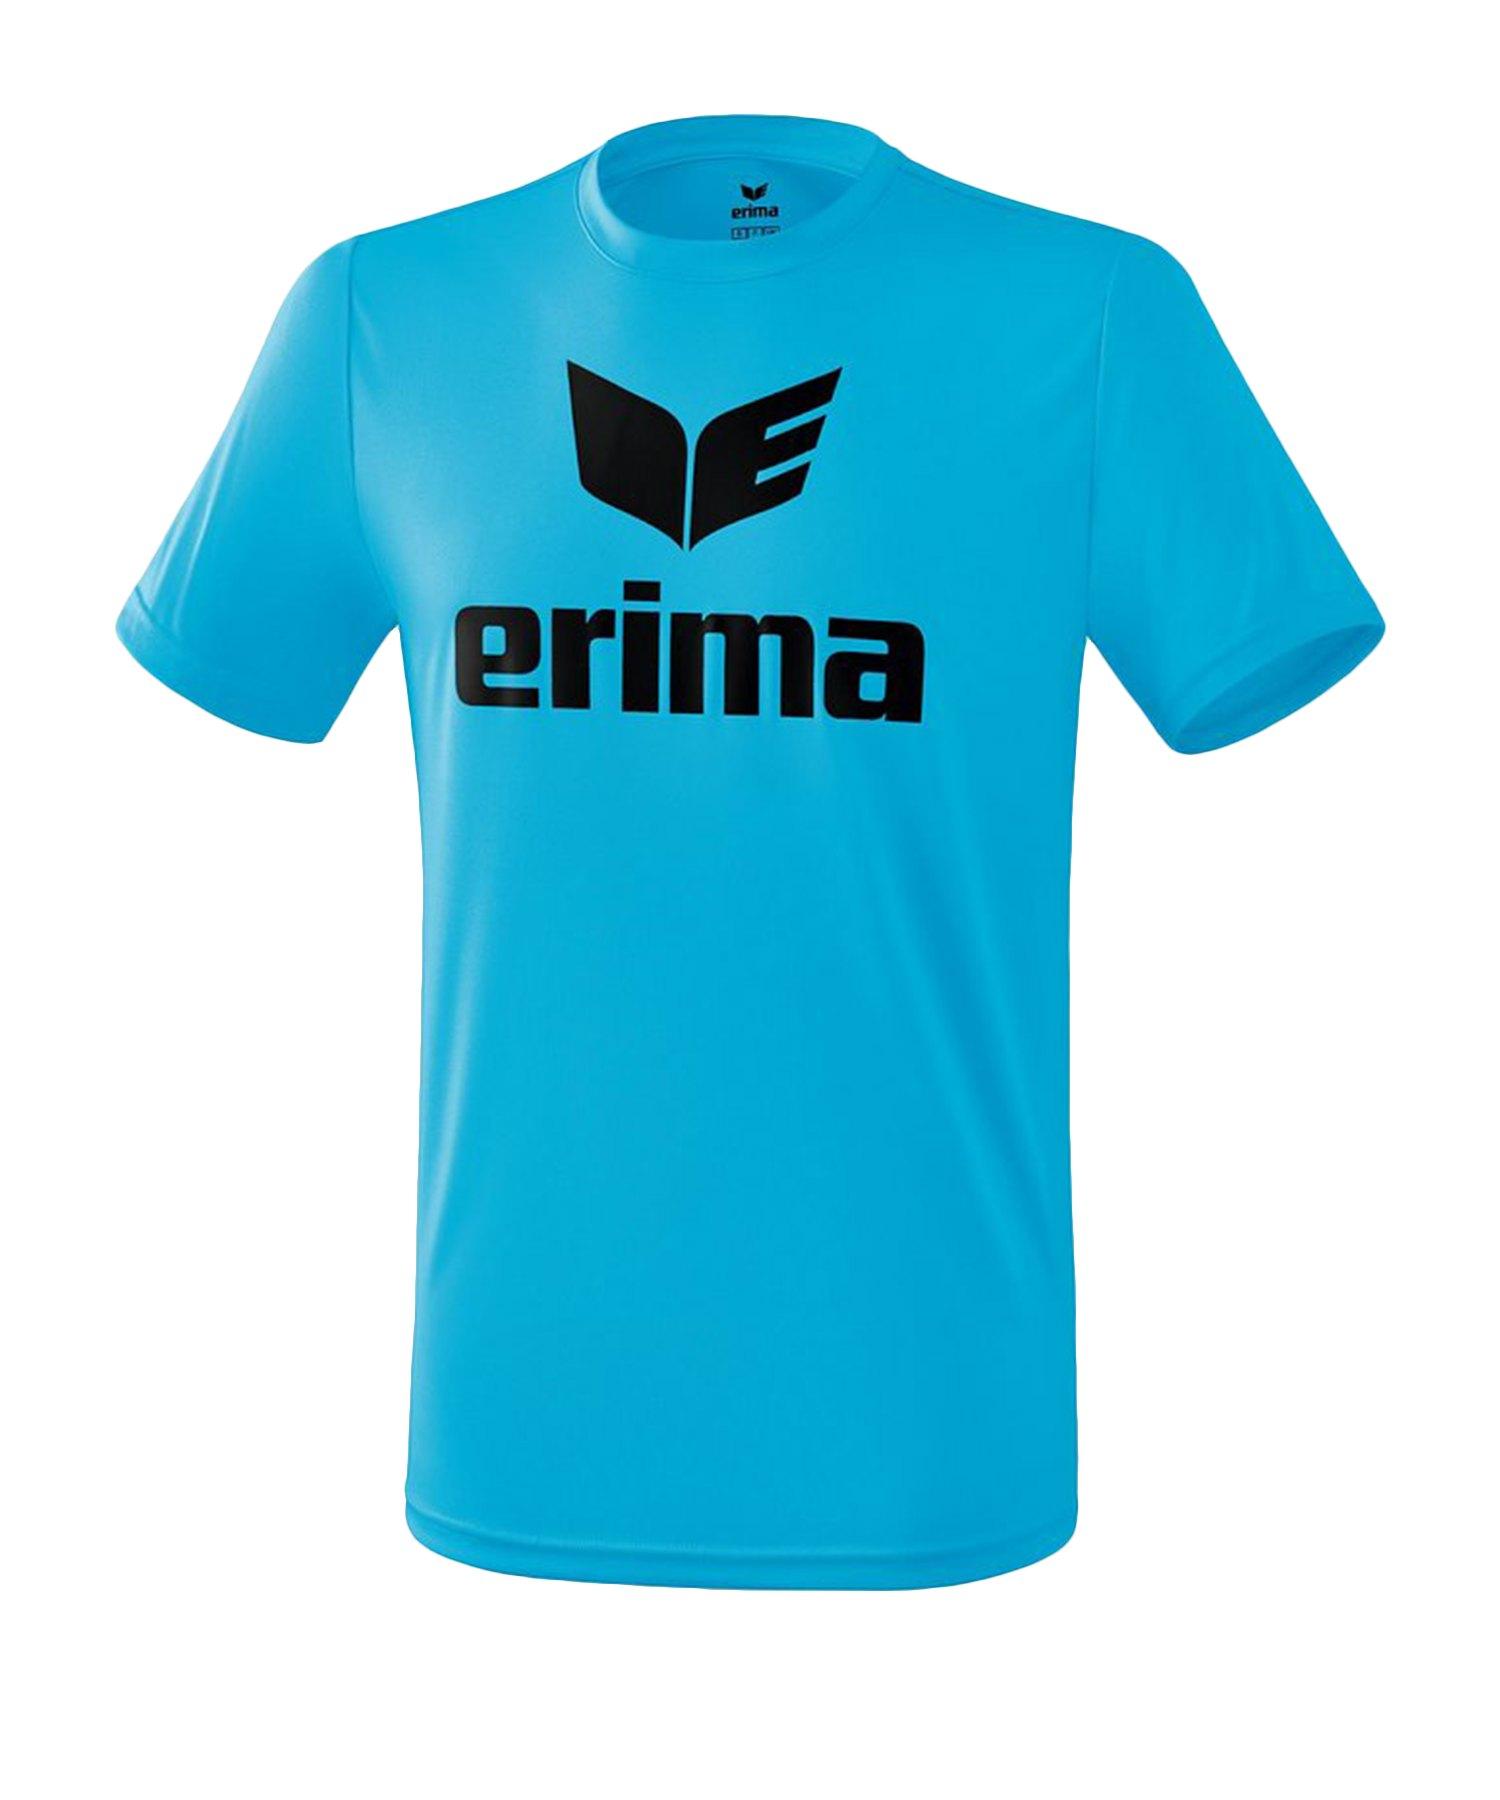 Erima Funktions Promo T-Shirt Kids Blau Schwarz - Blau